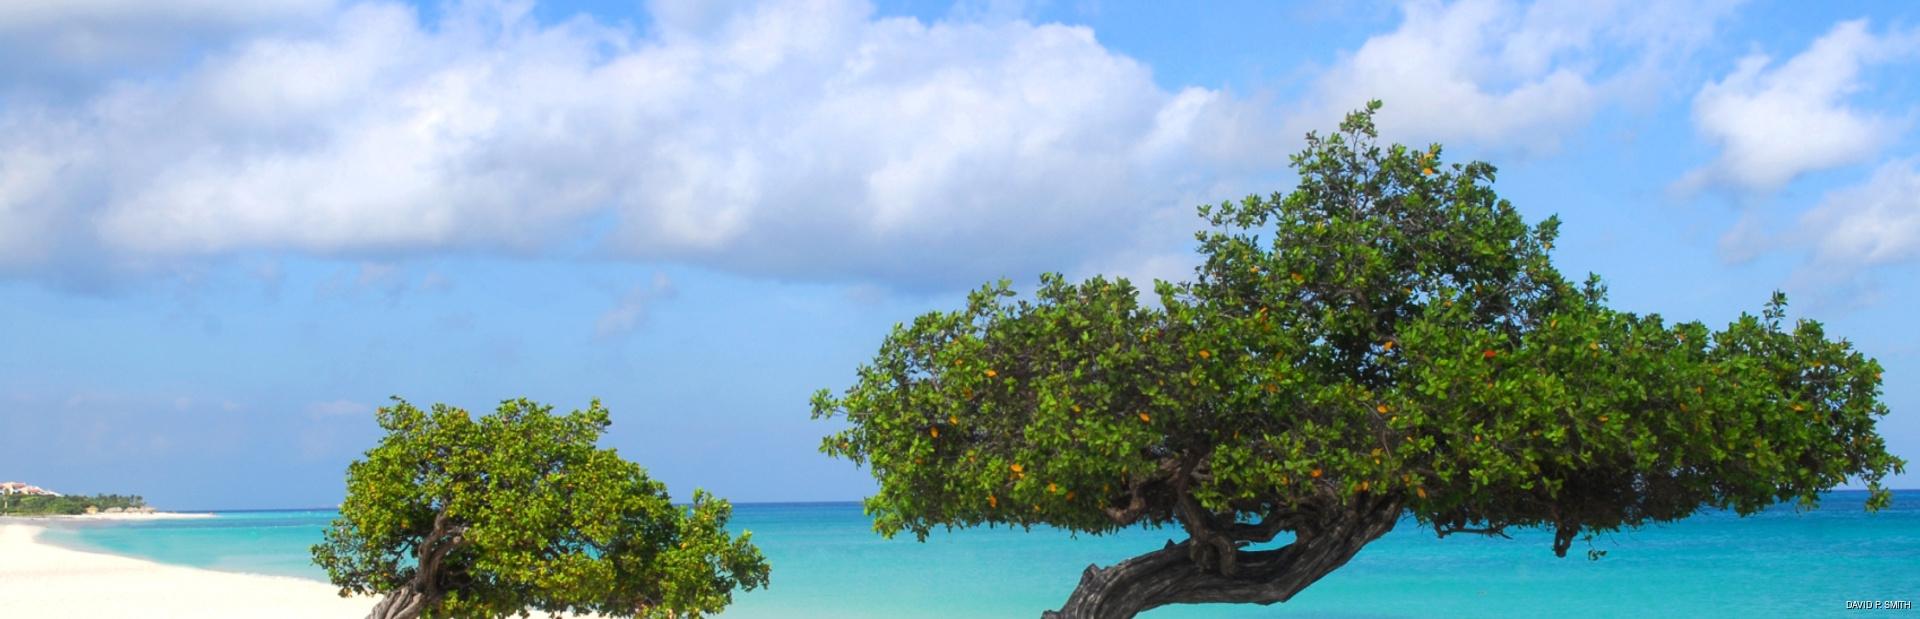 Trees on the empty white beach